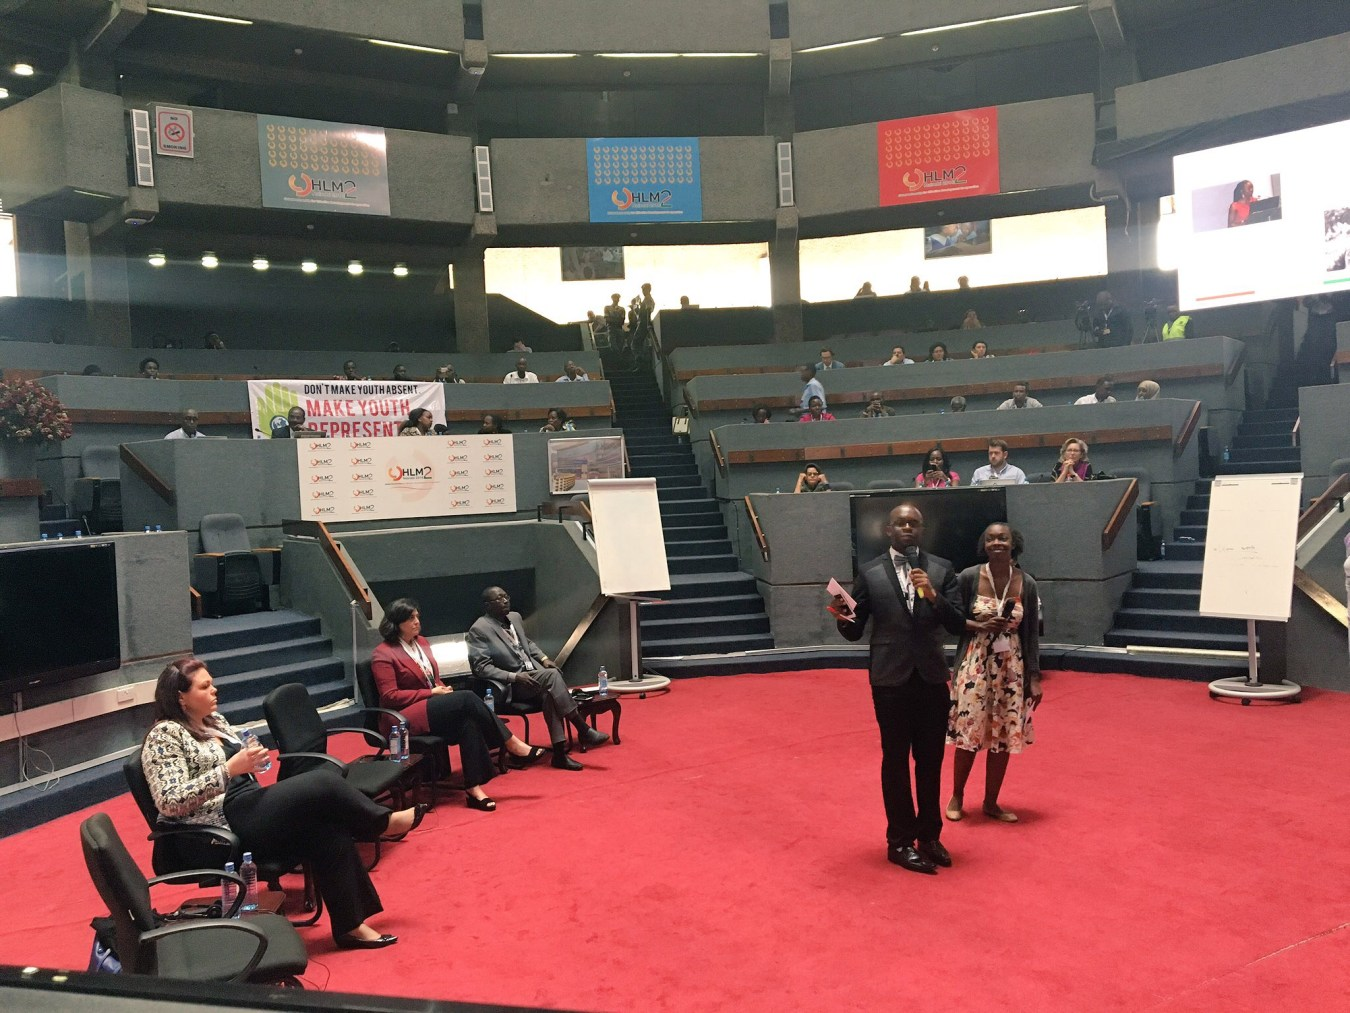 YouTube Change Ambassador, Ingrid Nilsen joins panel on LGBTQIA rights at Social Good Summit